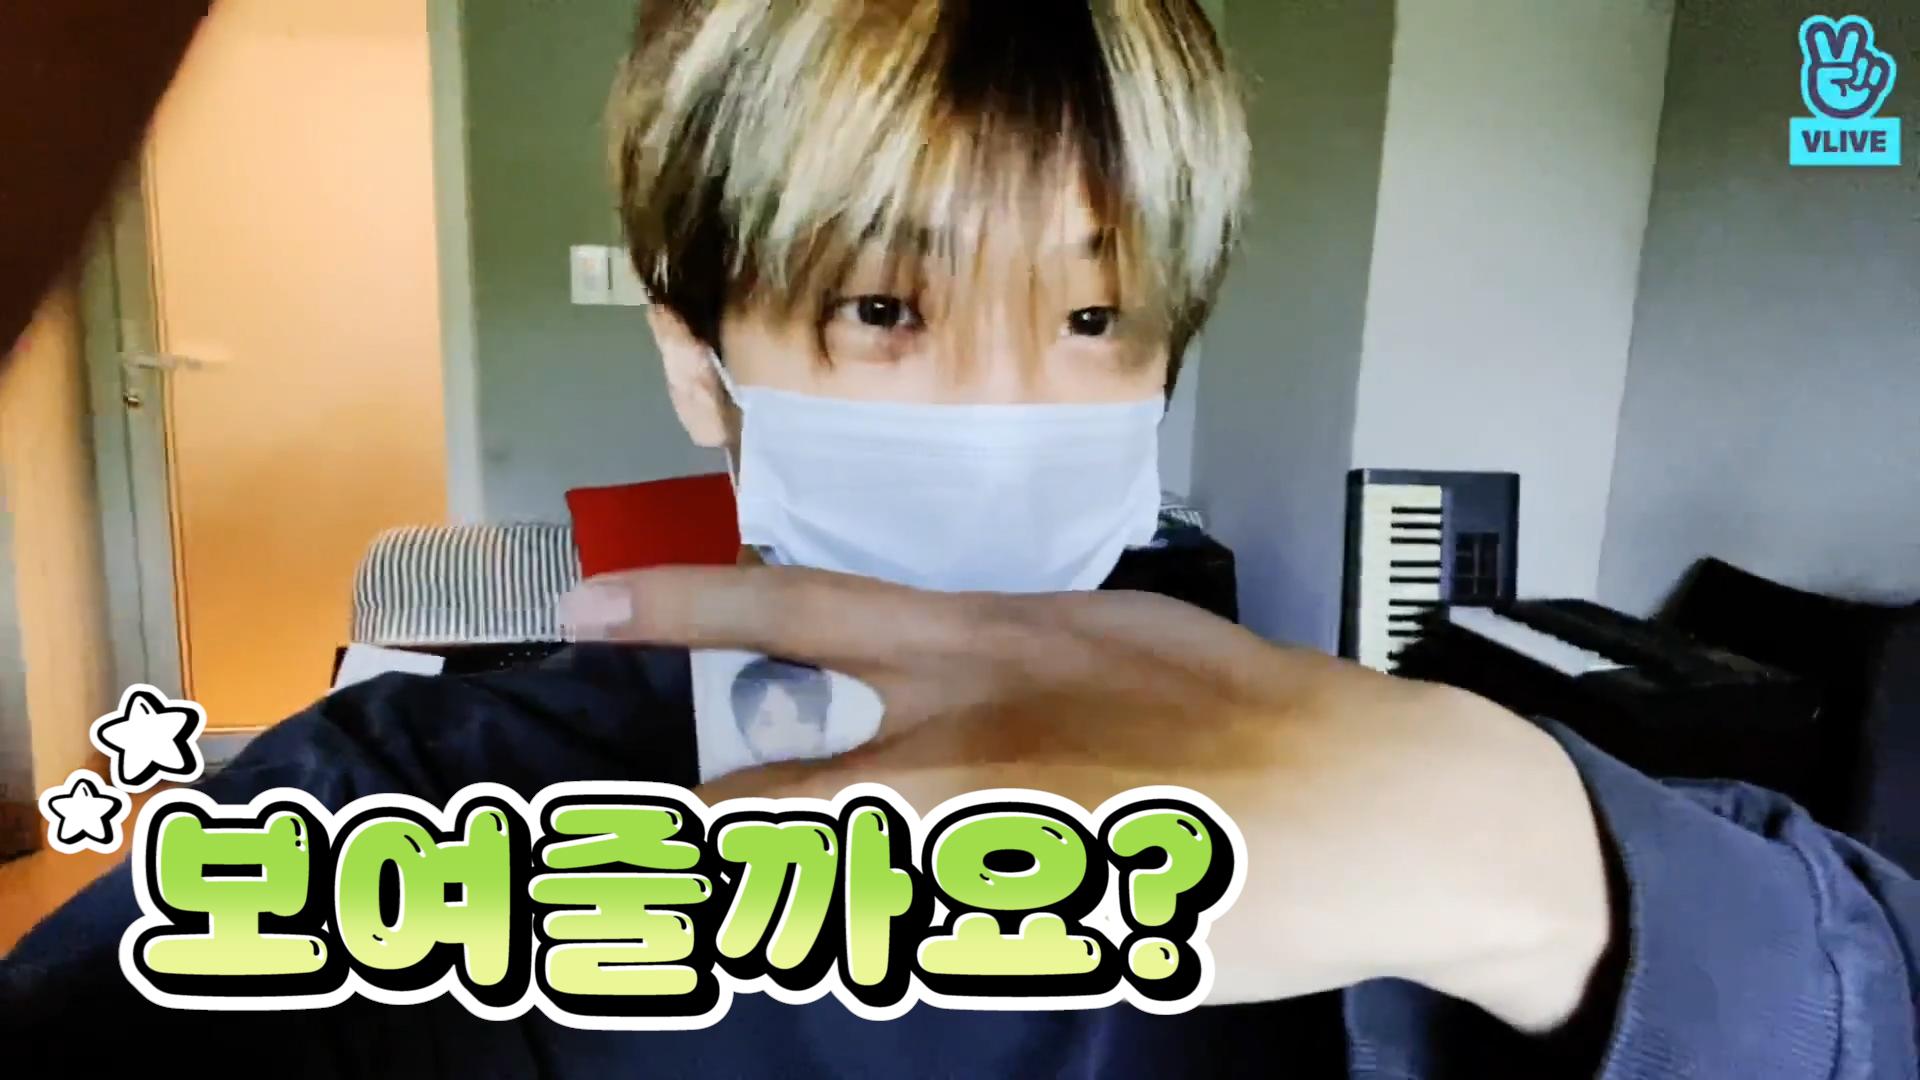 [NCT] 햄찌나라 왕자님도 민증이 필요한가요?🐹💚 (JISUNG showing his new ID picture)